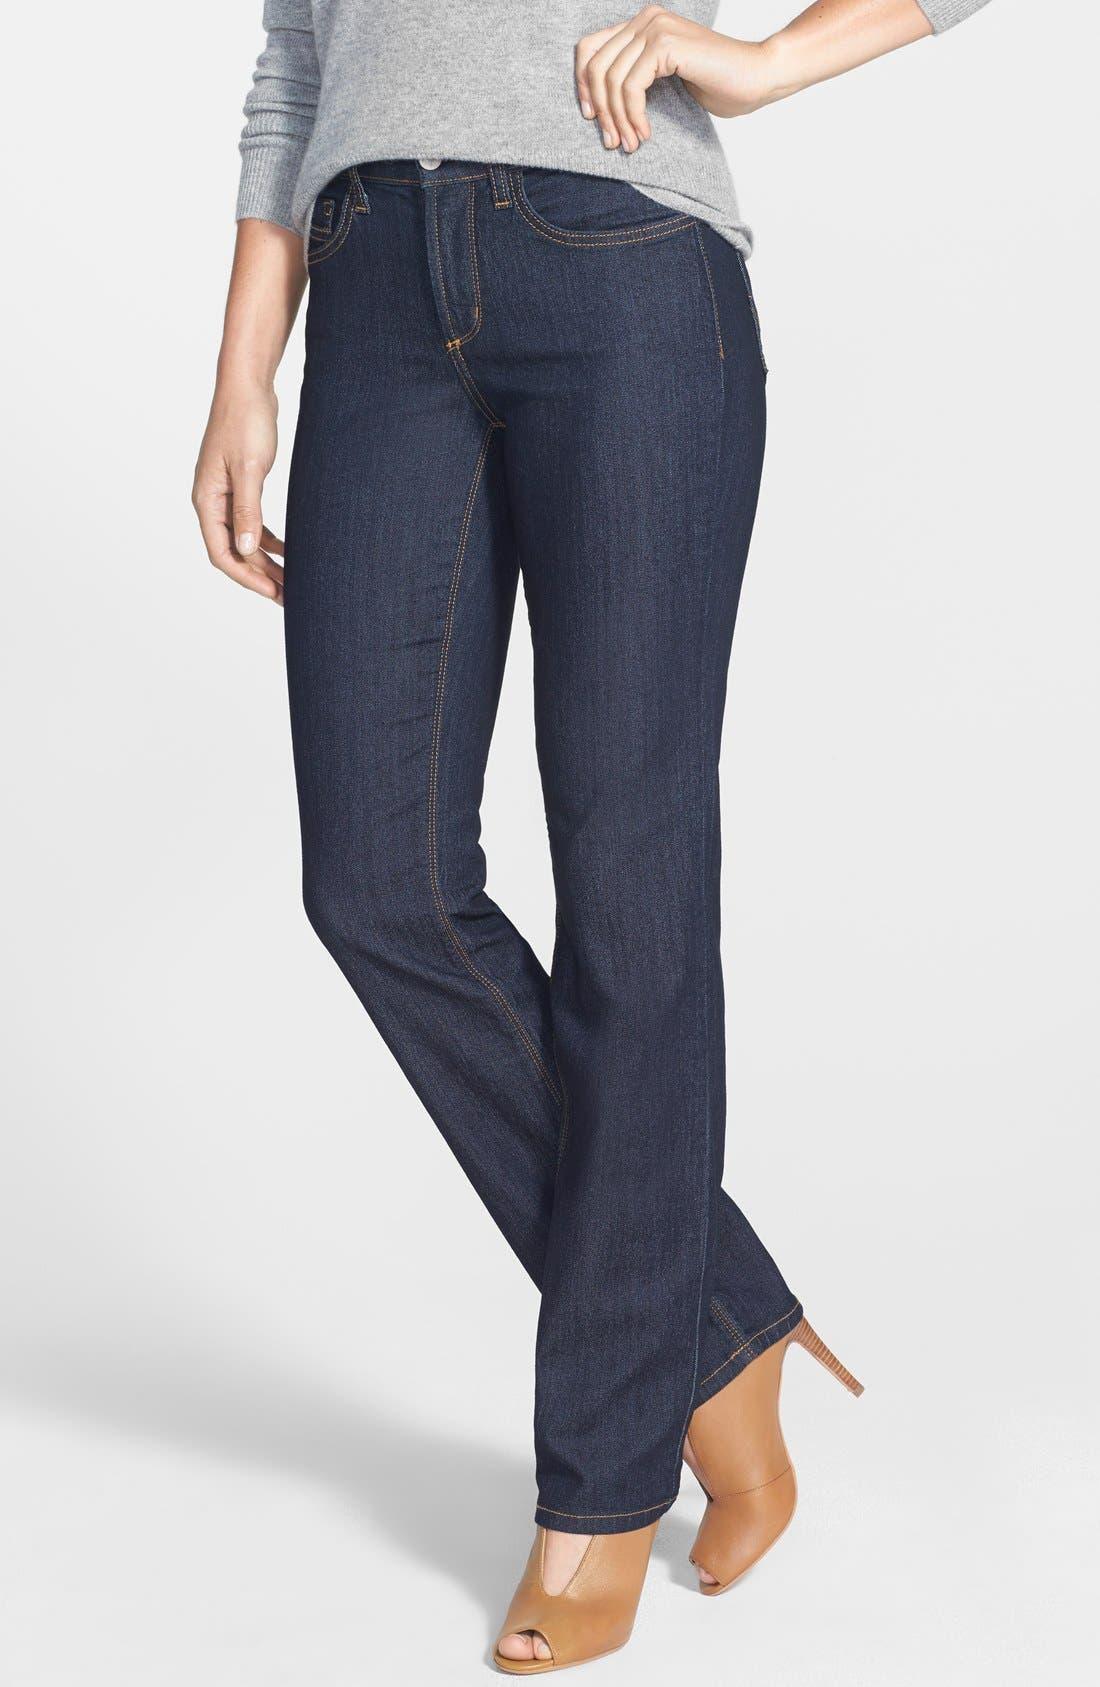 Alternate Image 1 Selected - NYDJ 'Marilyn' Stretch Straight Leg Jeans (Dark Enzyme) (Regular & Petite)